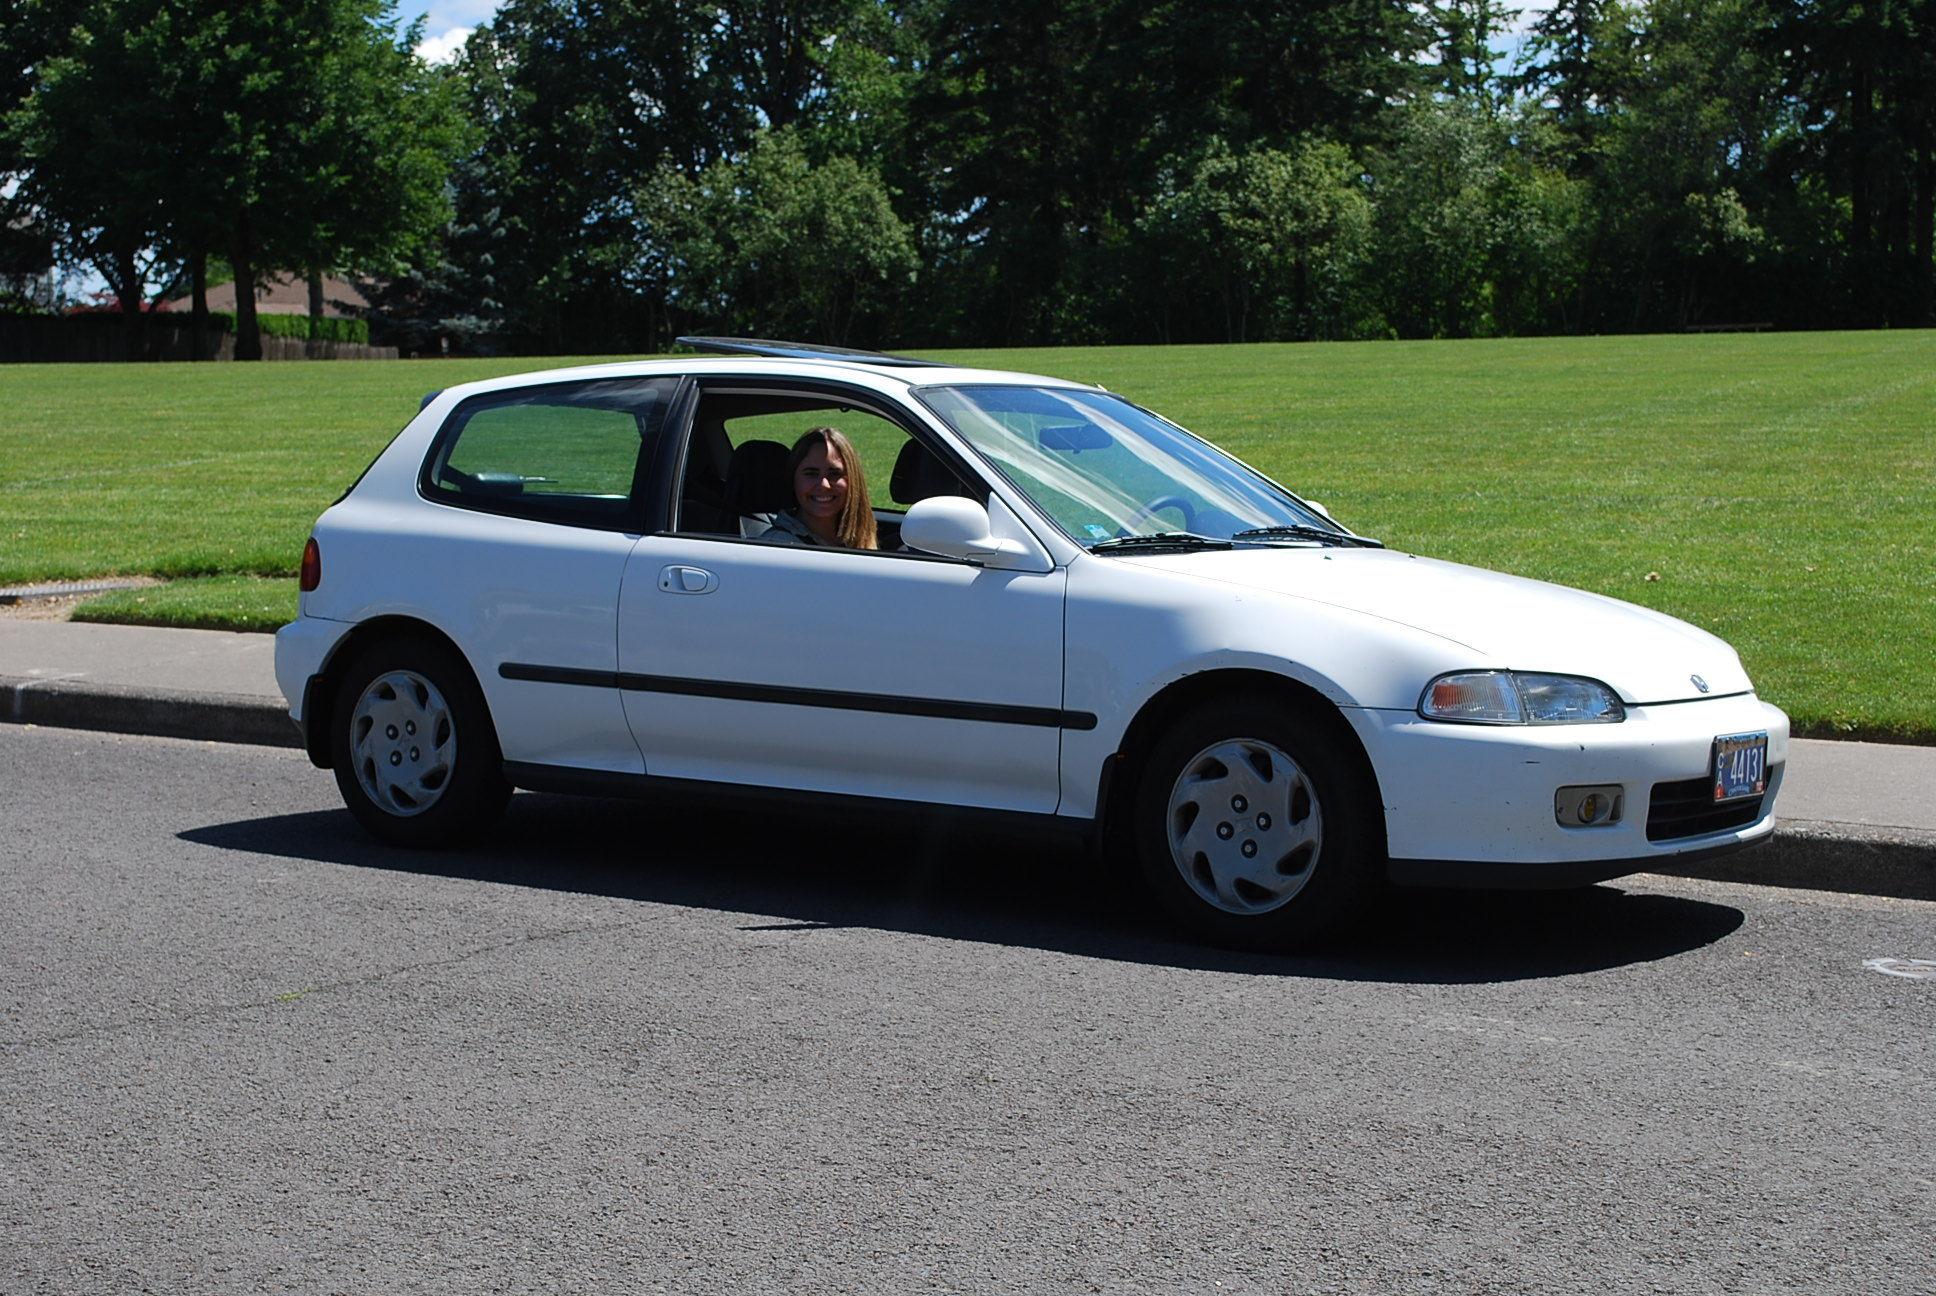 weatherall123's 1994 Honda Civic SI hatchback build ...